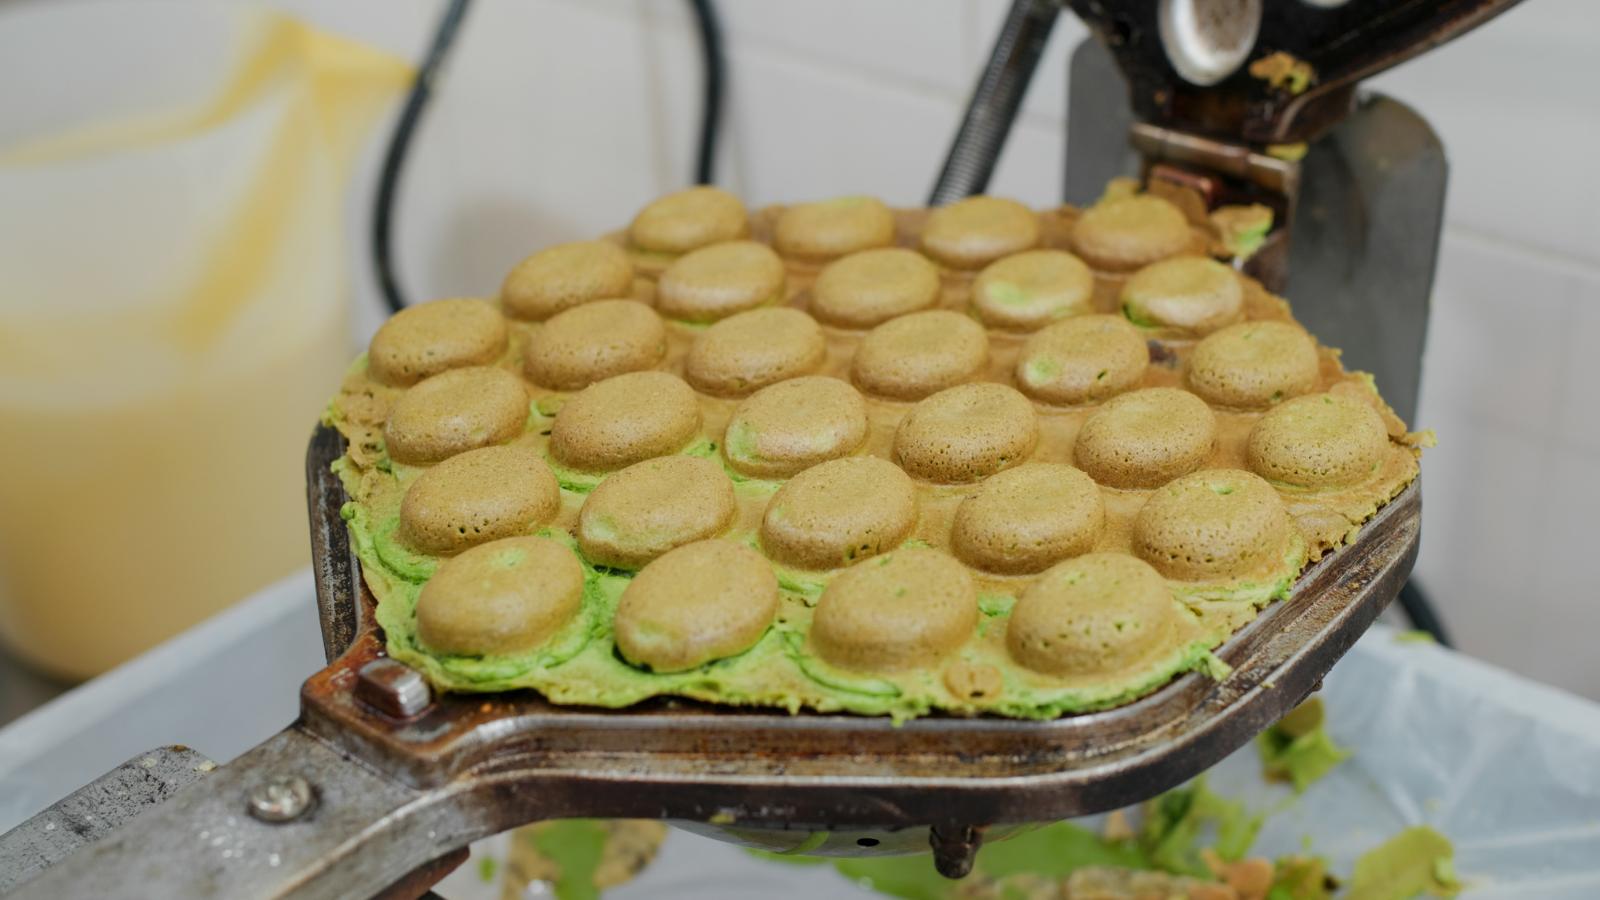 Egg Waffle street food in Hong Kong.